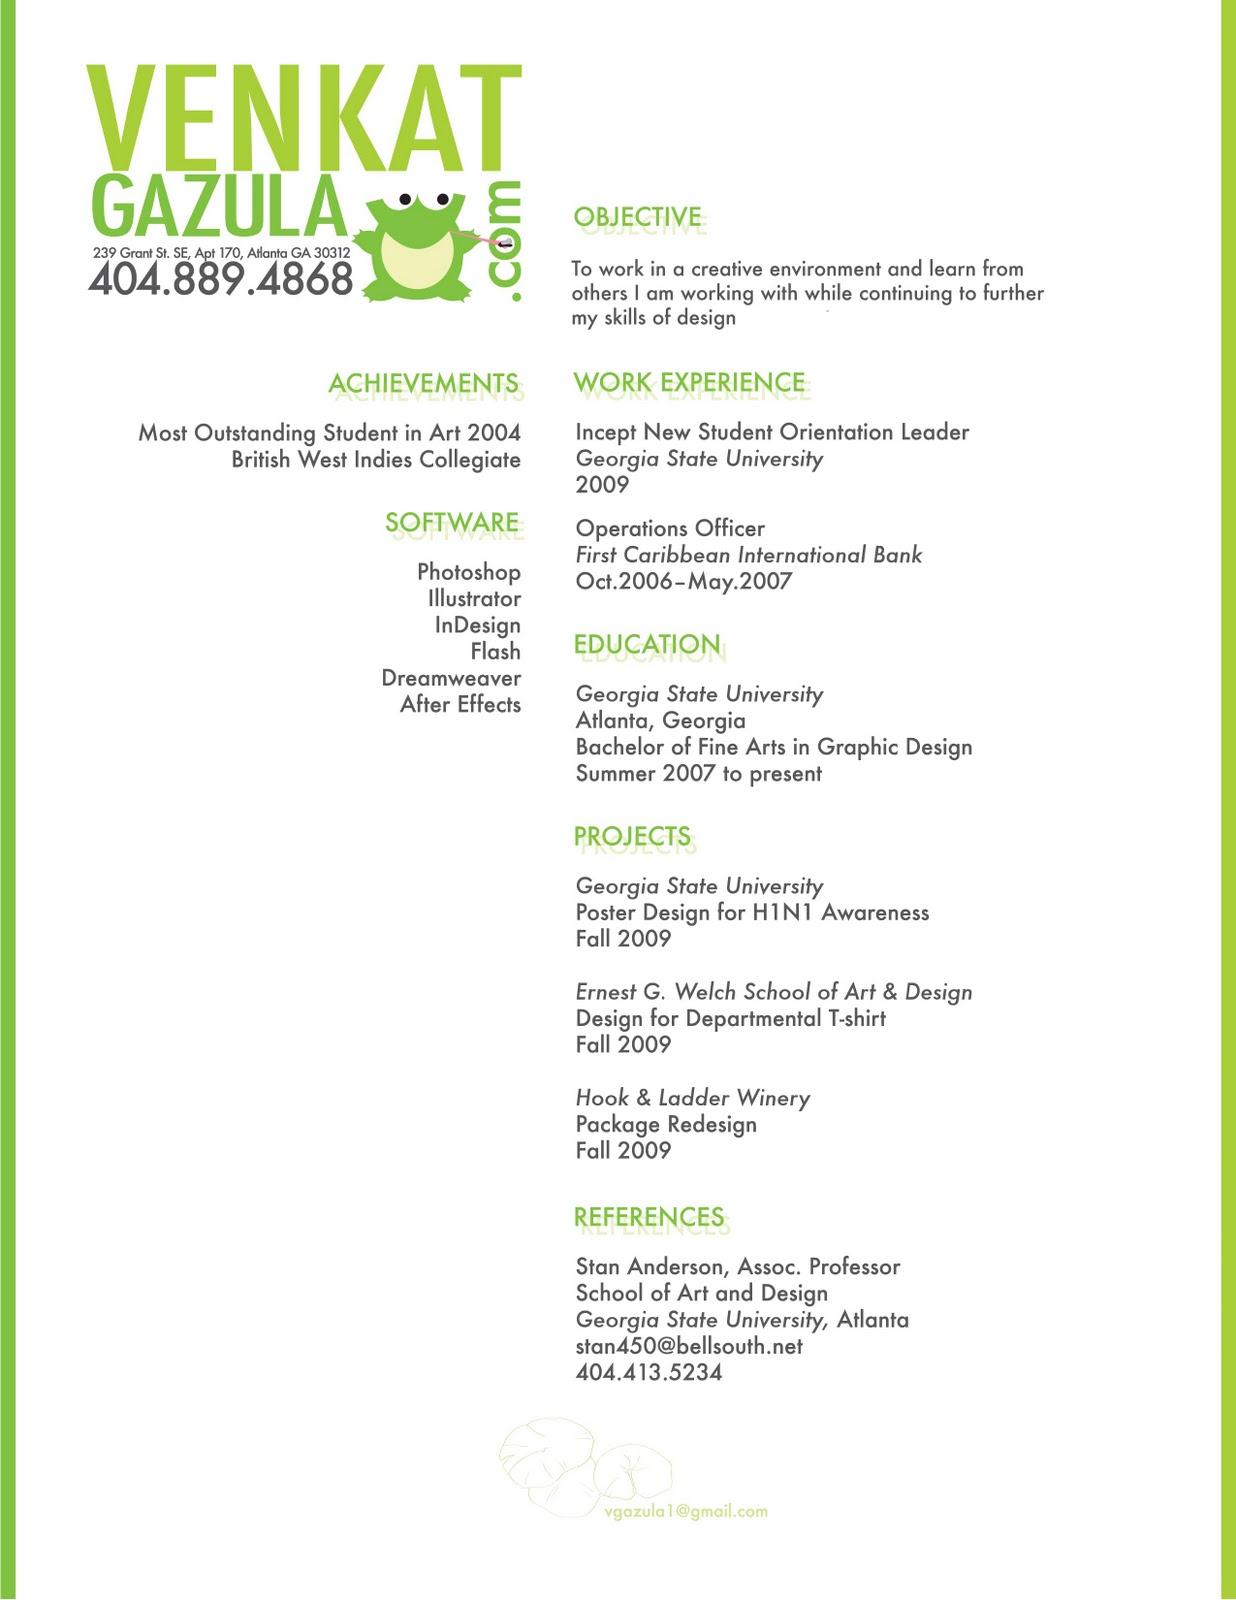 4950 portfolio  venkat gazula resume